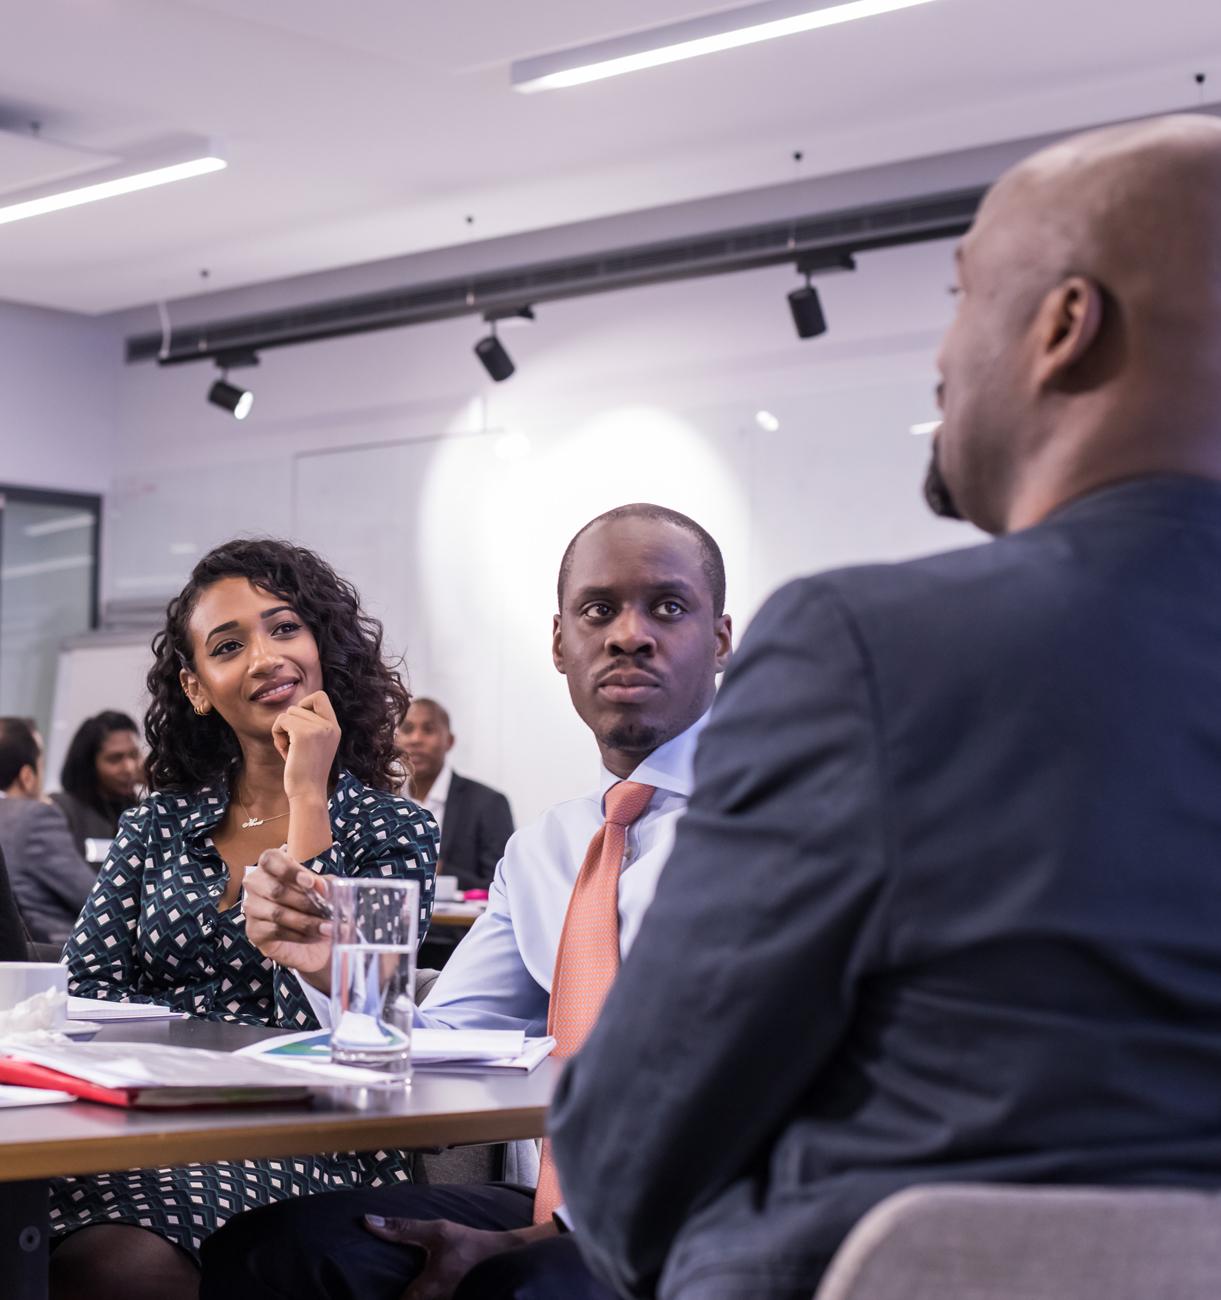 Ethnic minority recruitment